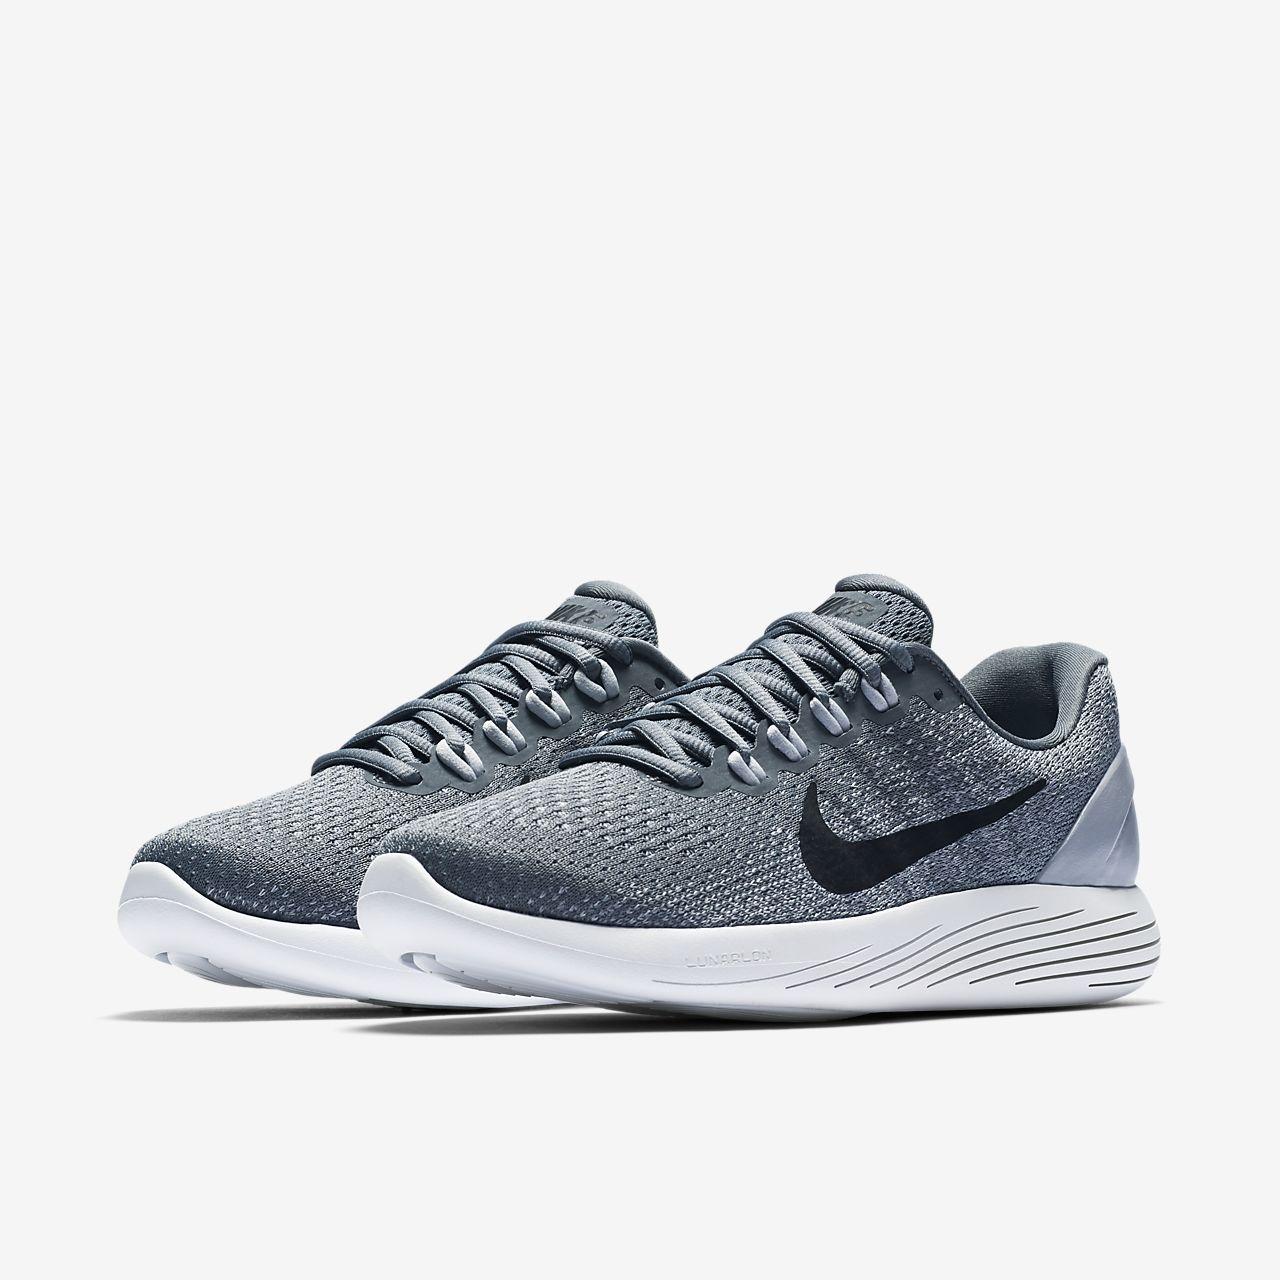 meet eefc3 18deb ... Calzado de running para mujer Nike LunarGlide 9